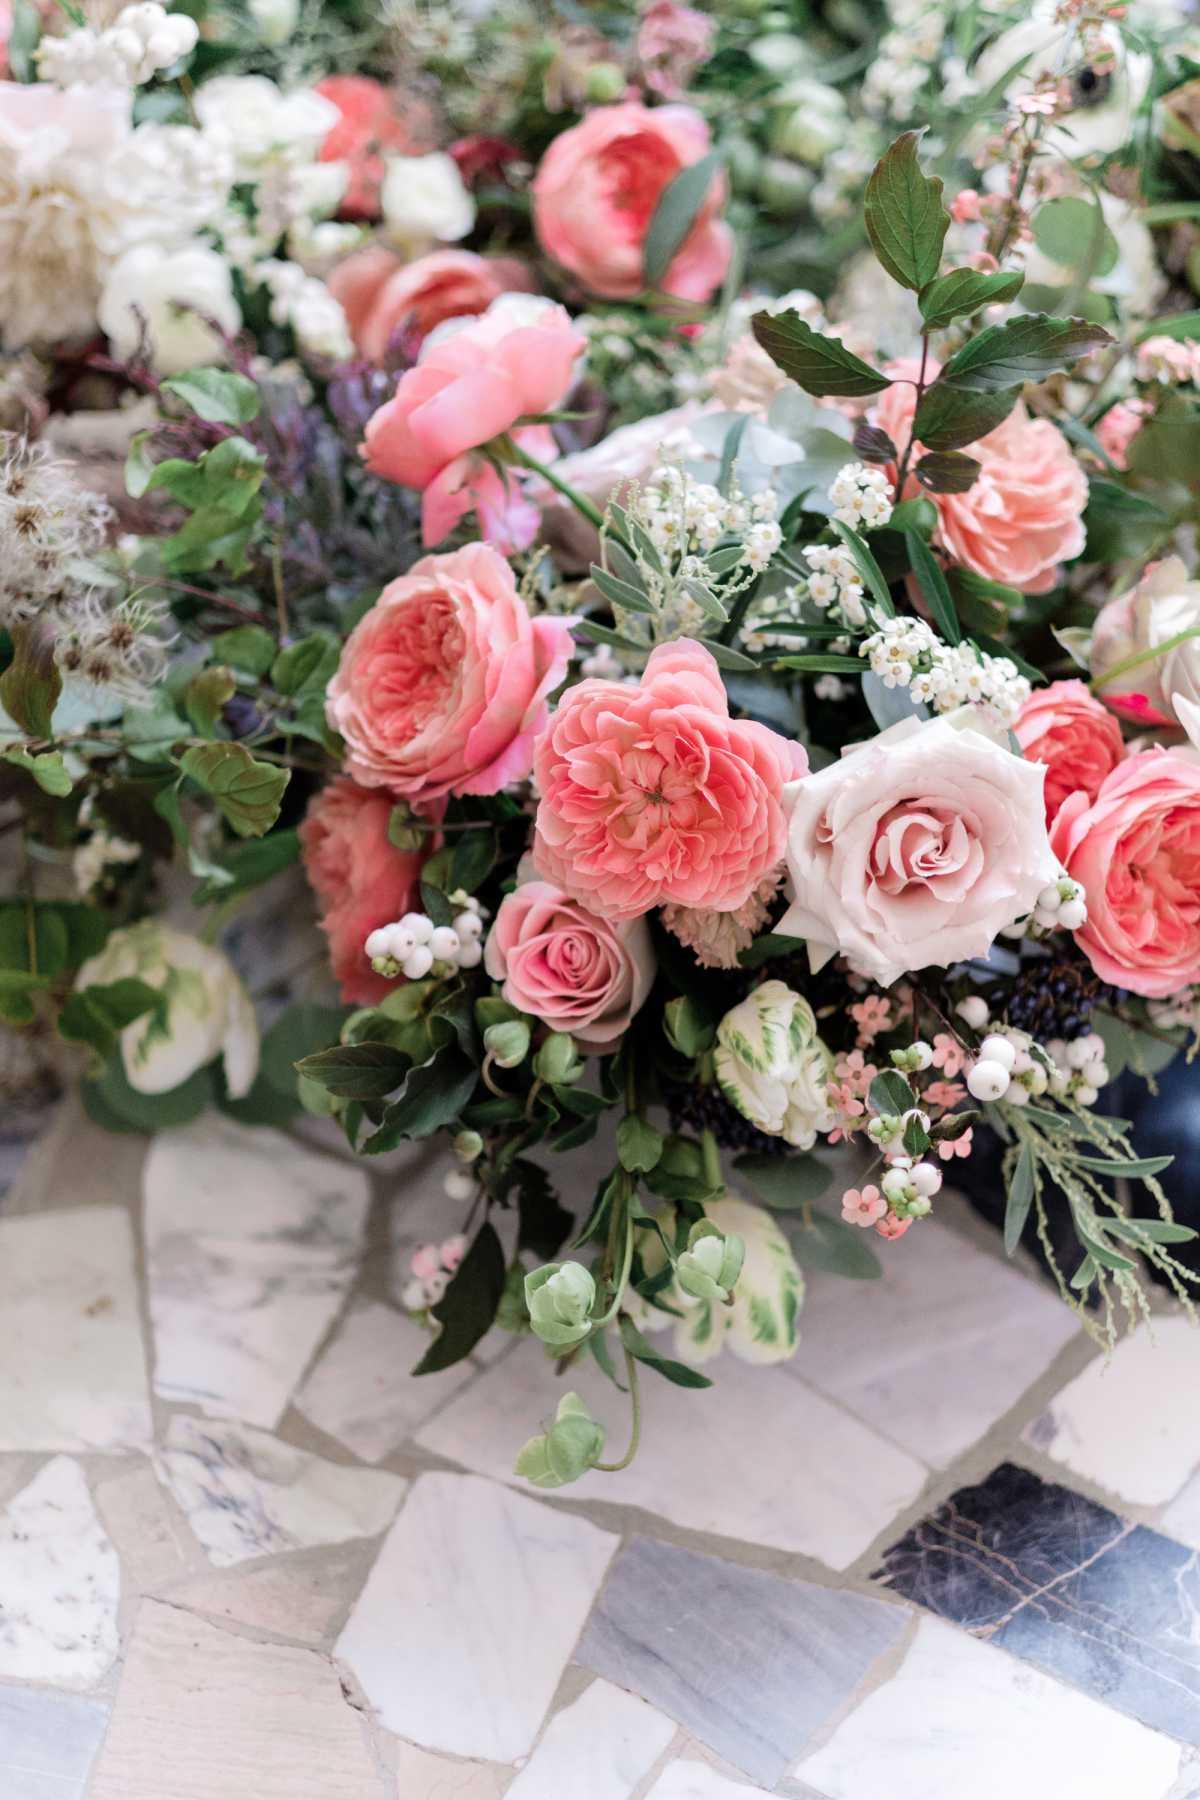 Composizioni di fiori a terra